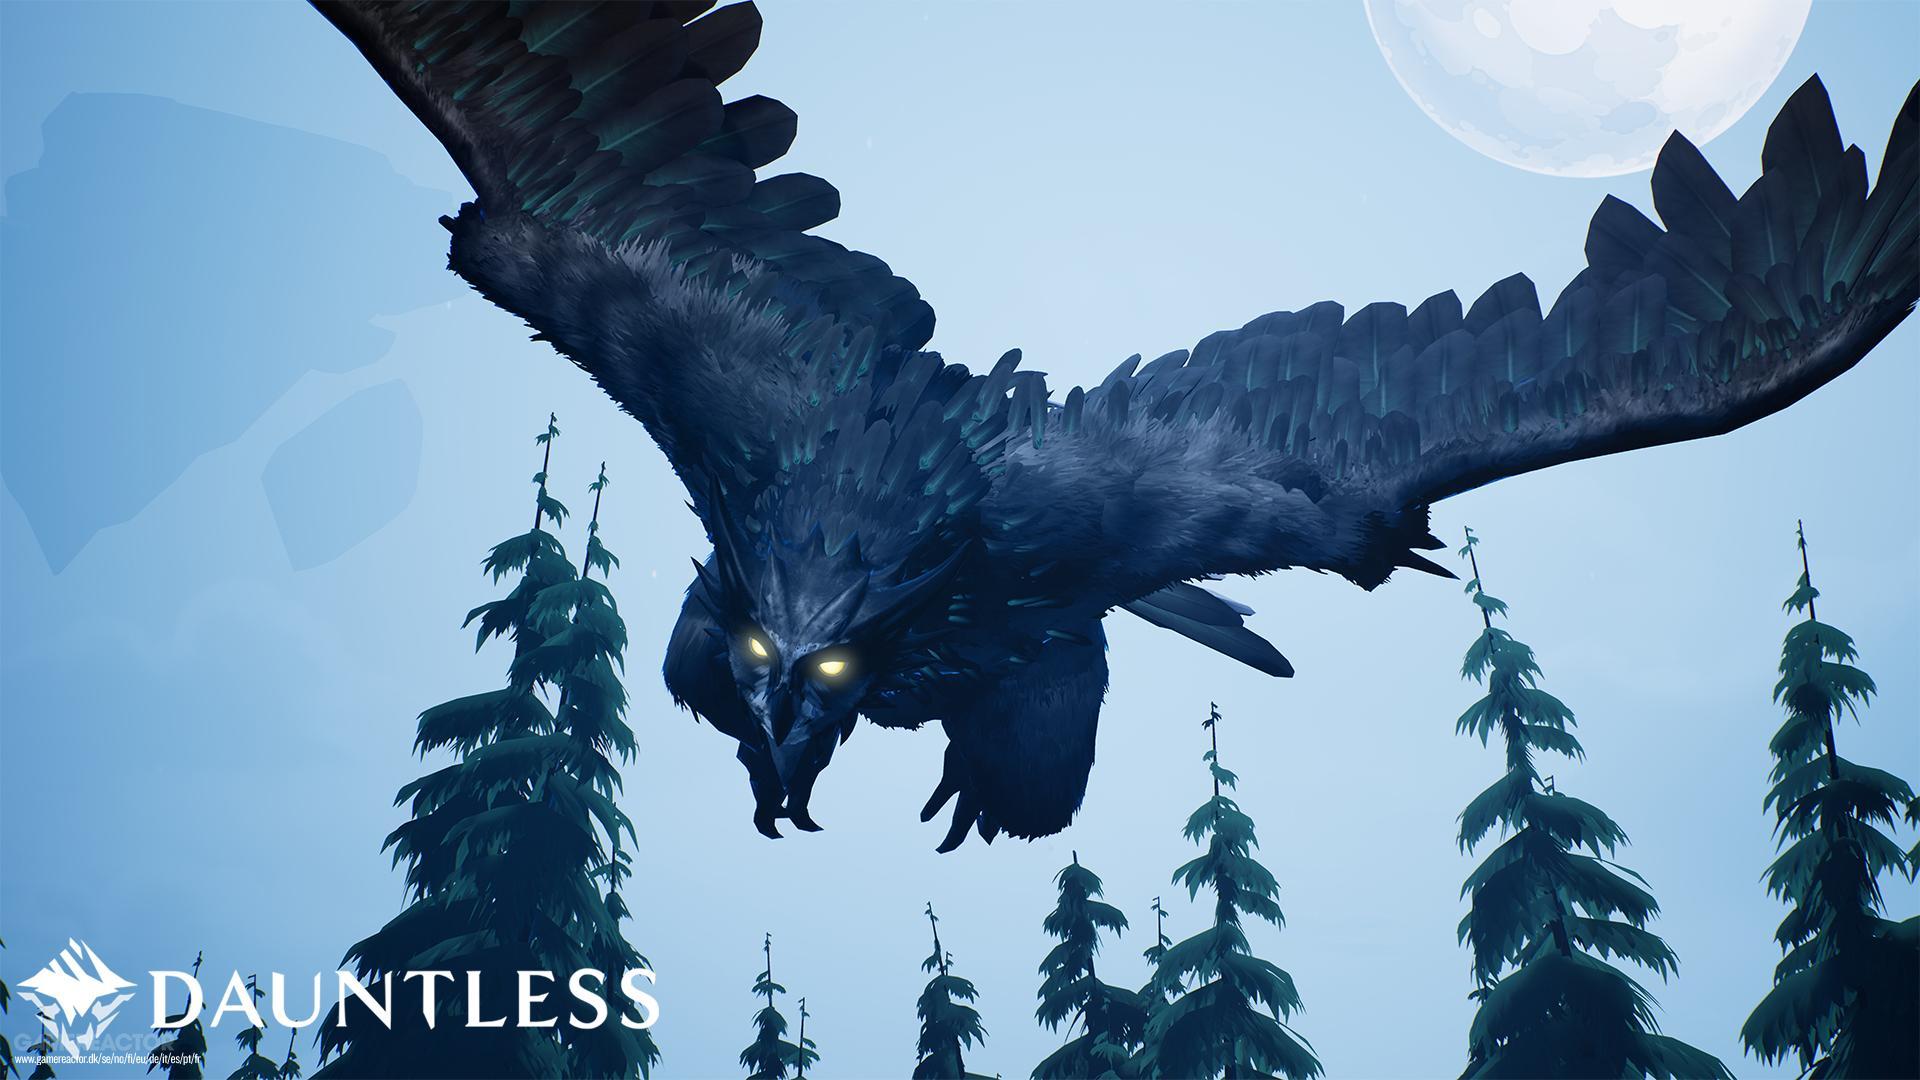 Development of Dauntless on Switch